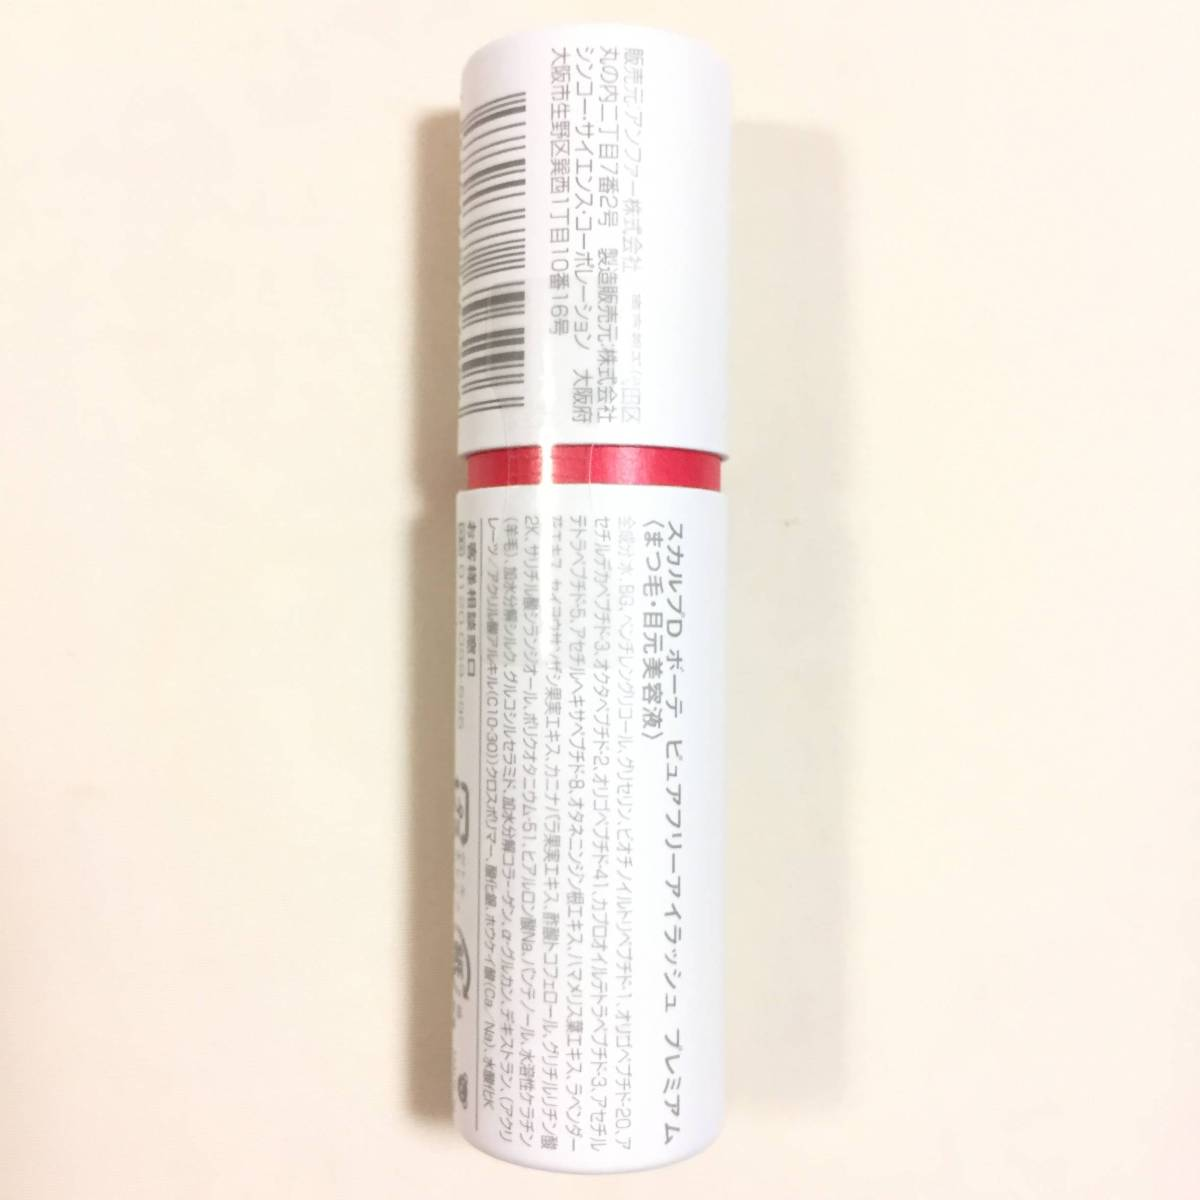 new goods * scalp D Beaute pure free eyelashes premium ( eyelashes beauty care liquid )*